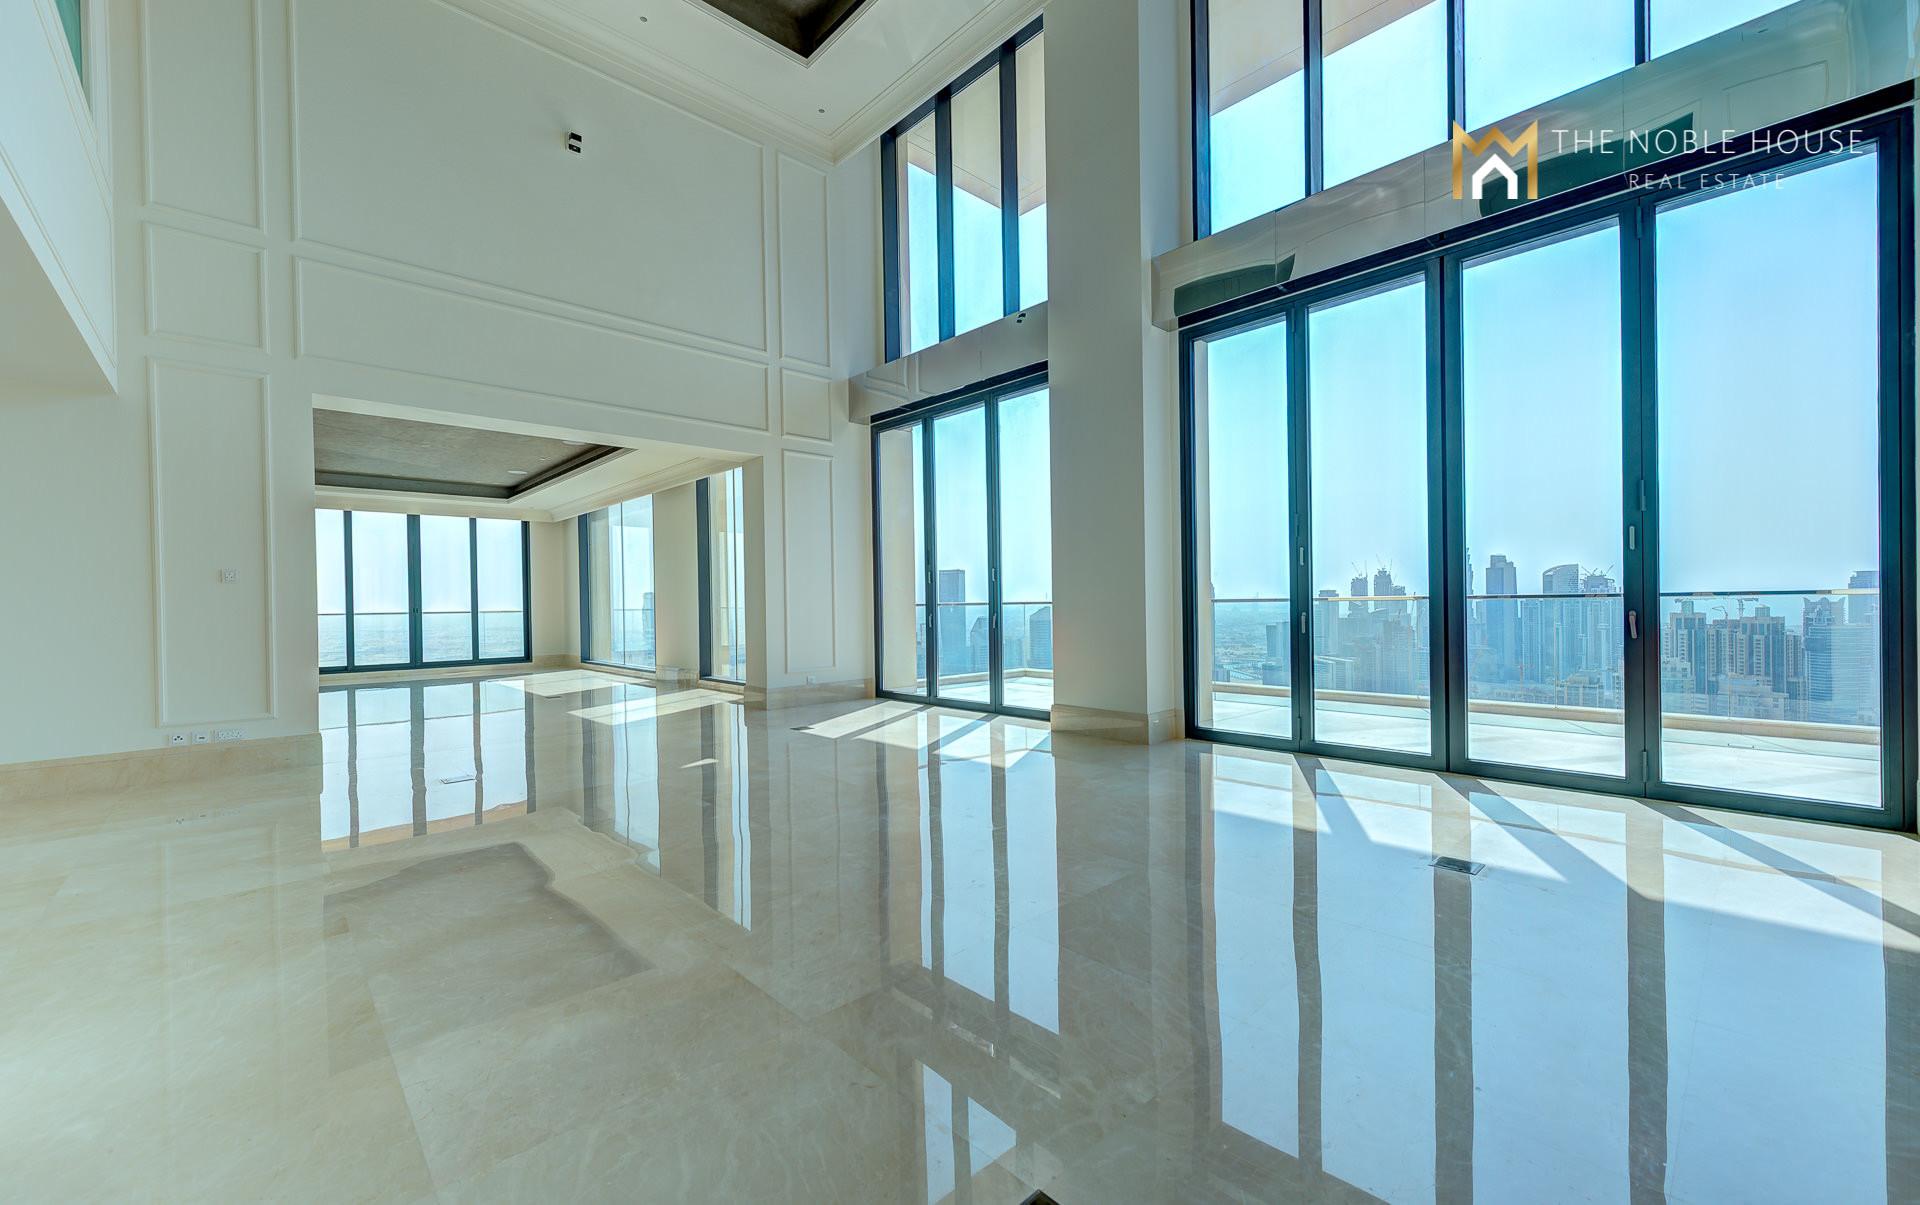 Ihram Kids For Sale Dubai: The 118 Duplex With 360 Degree Views Of Dubai